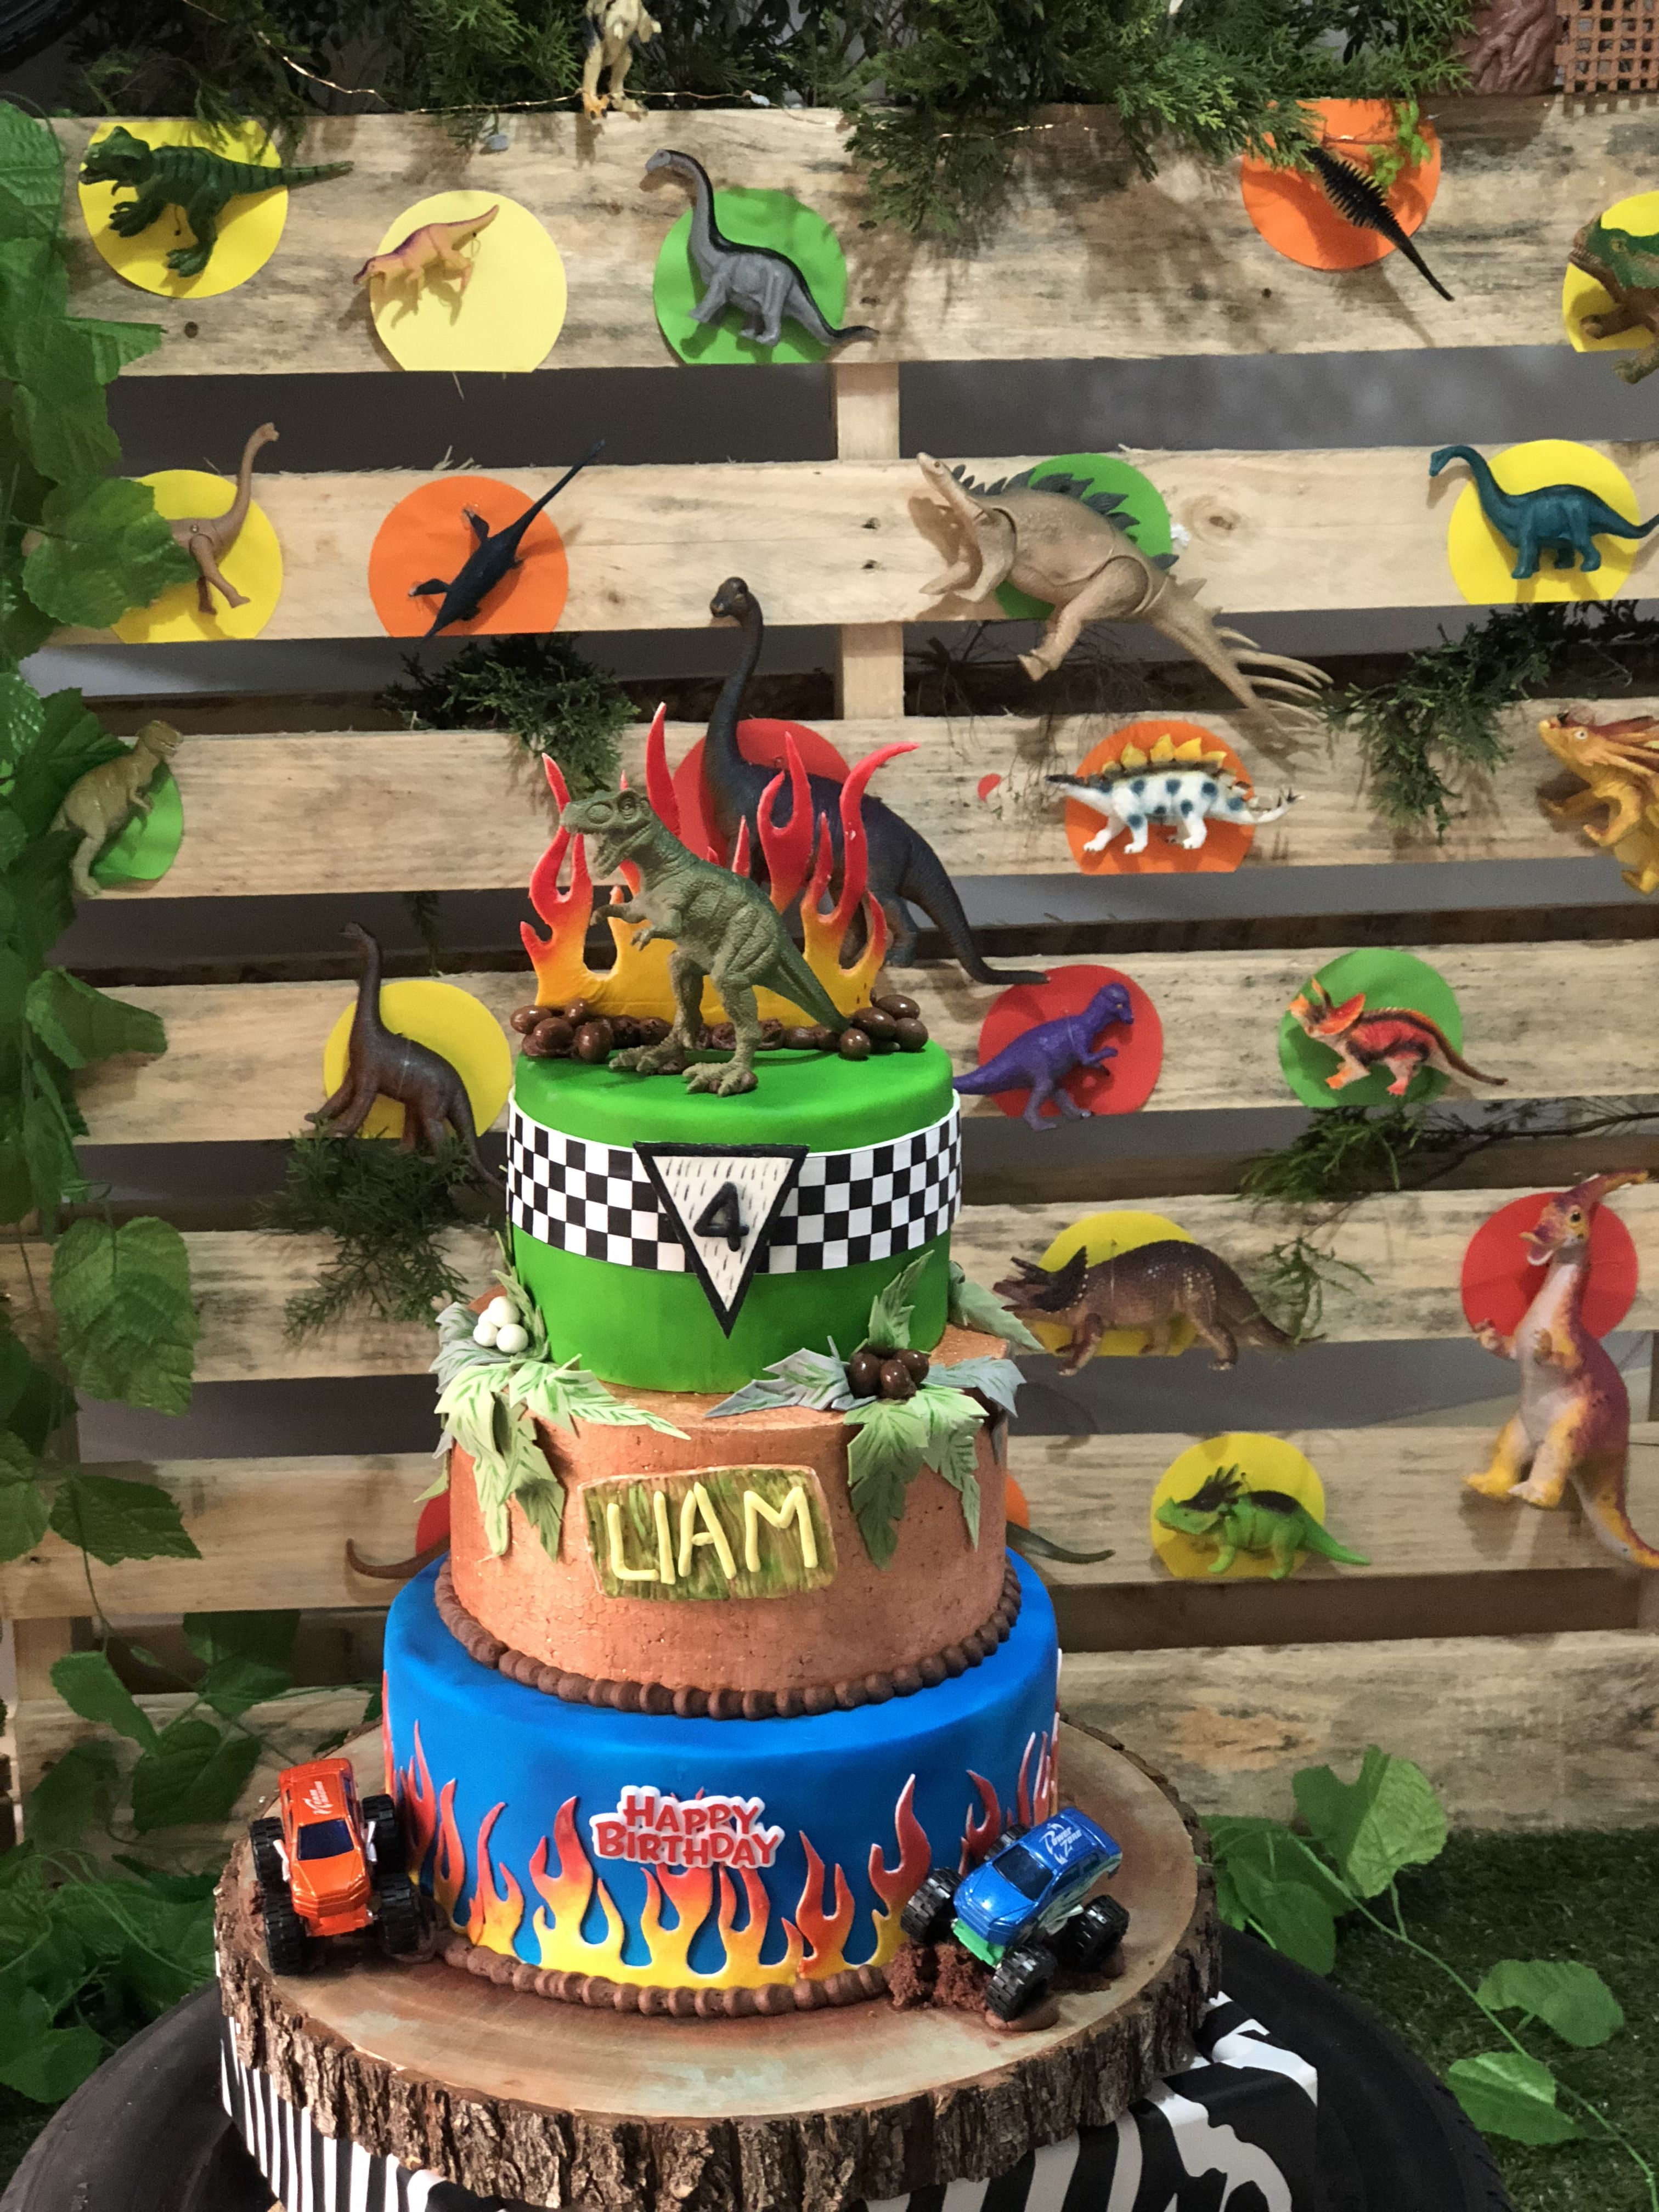 Pin By Jessica Chateau On Arthur S 4th Birthday Monster Trucks Birthday Party Birthday Fun Trucks Birthday Party